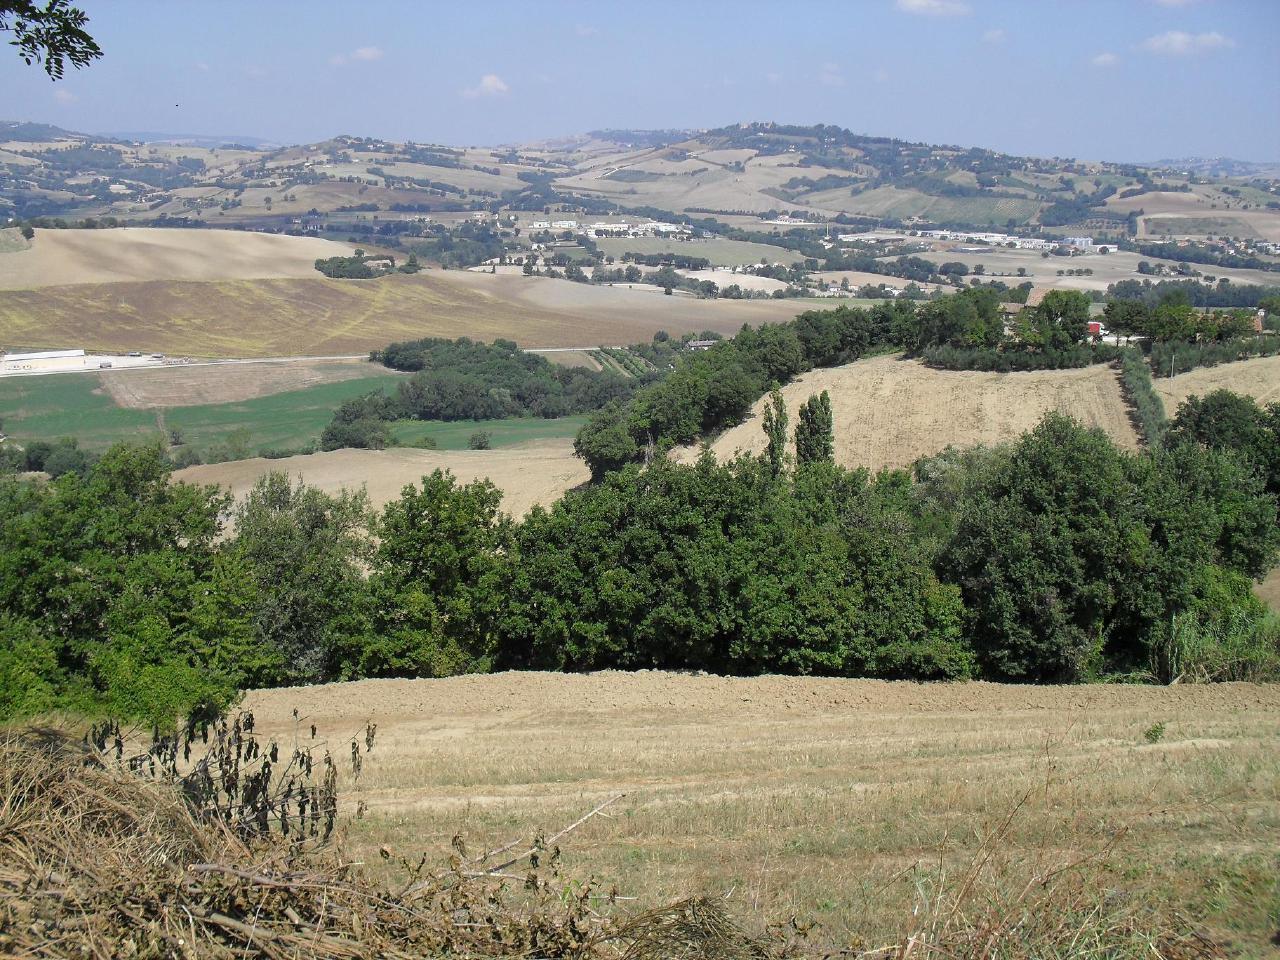 Ferienhaus La Mia Piccola Casetta (444725), Arcevia, Ancona, Marken, Italien, Bild 31